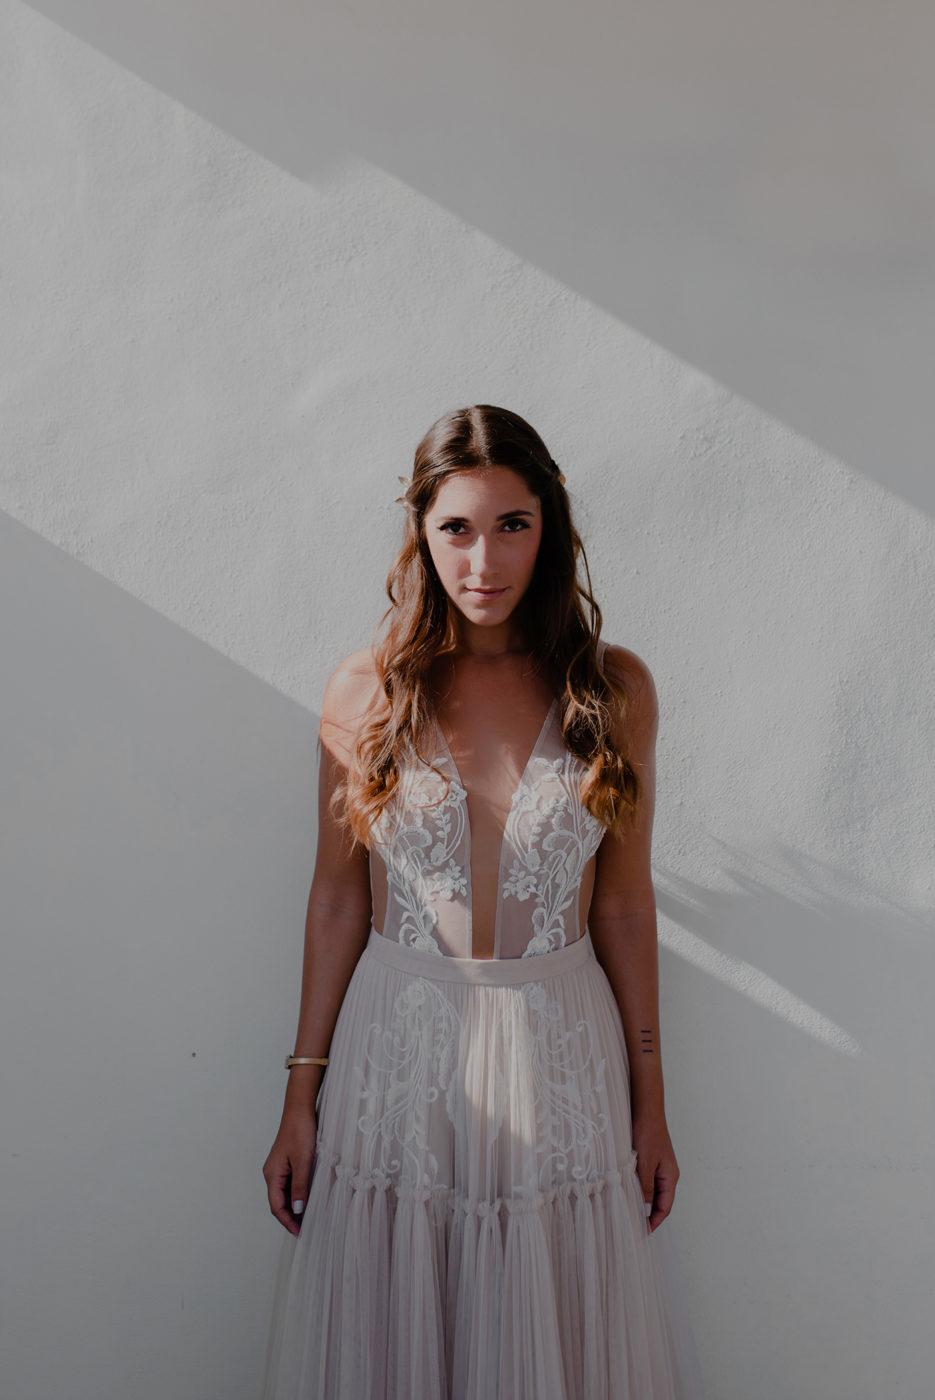 kirill-samarits-wedding-photography-koufonisia-greece-couple-photographer (23)